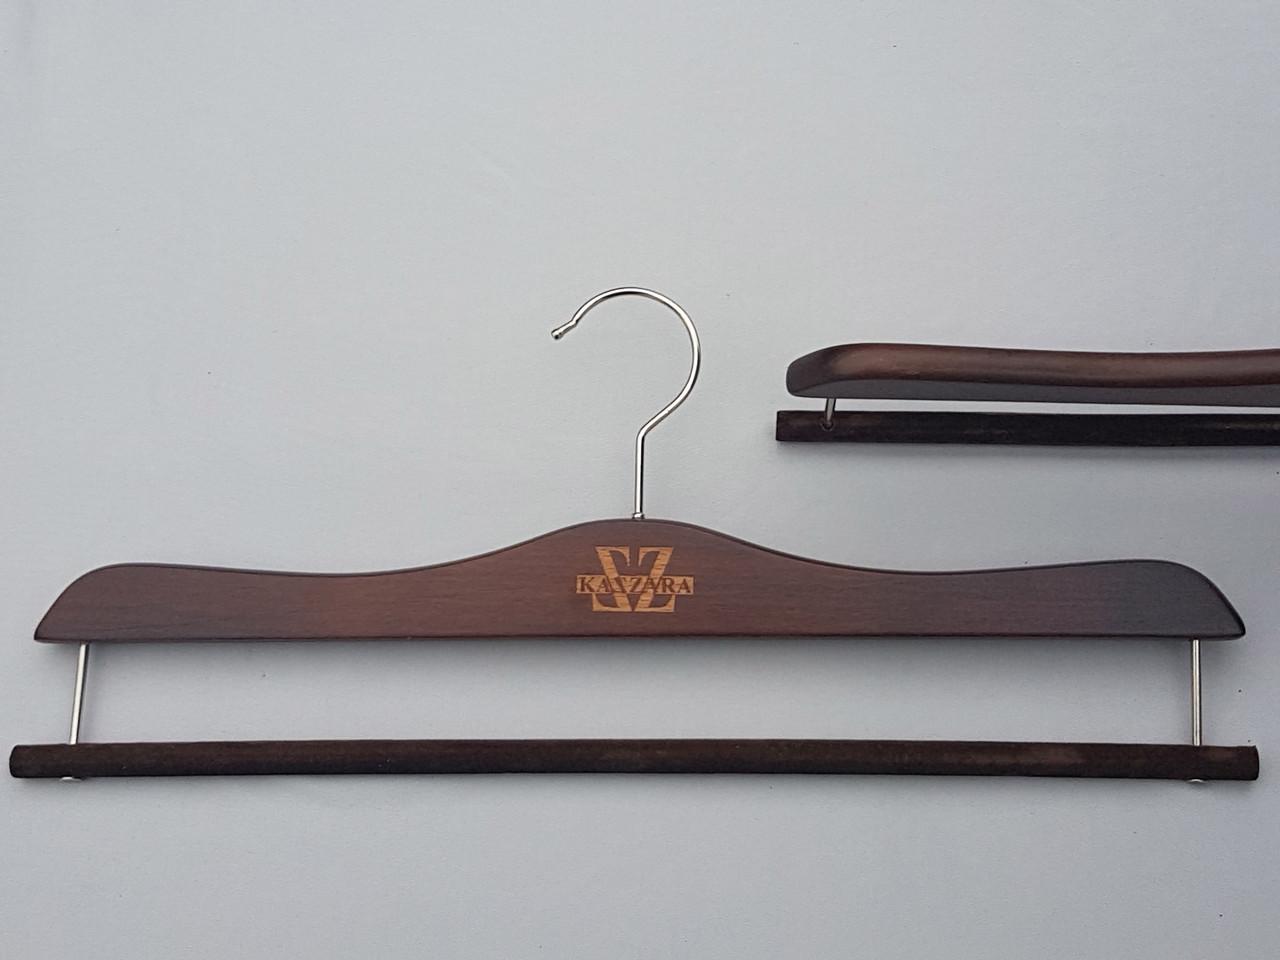 Плечики длиной 41 см вешалки деревянные для брюк и юбок Mainetti Kazara коричневого цвета для брюк и юбок